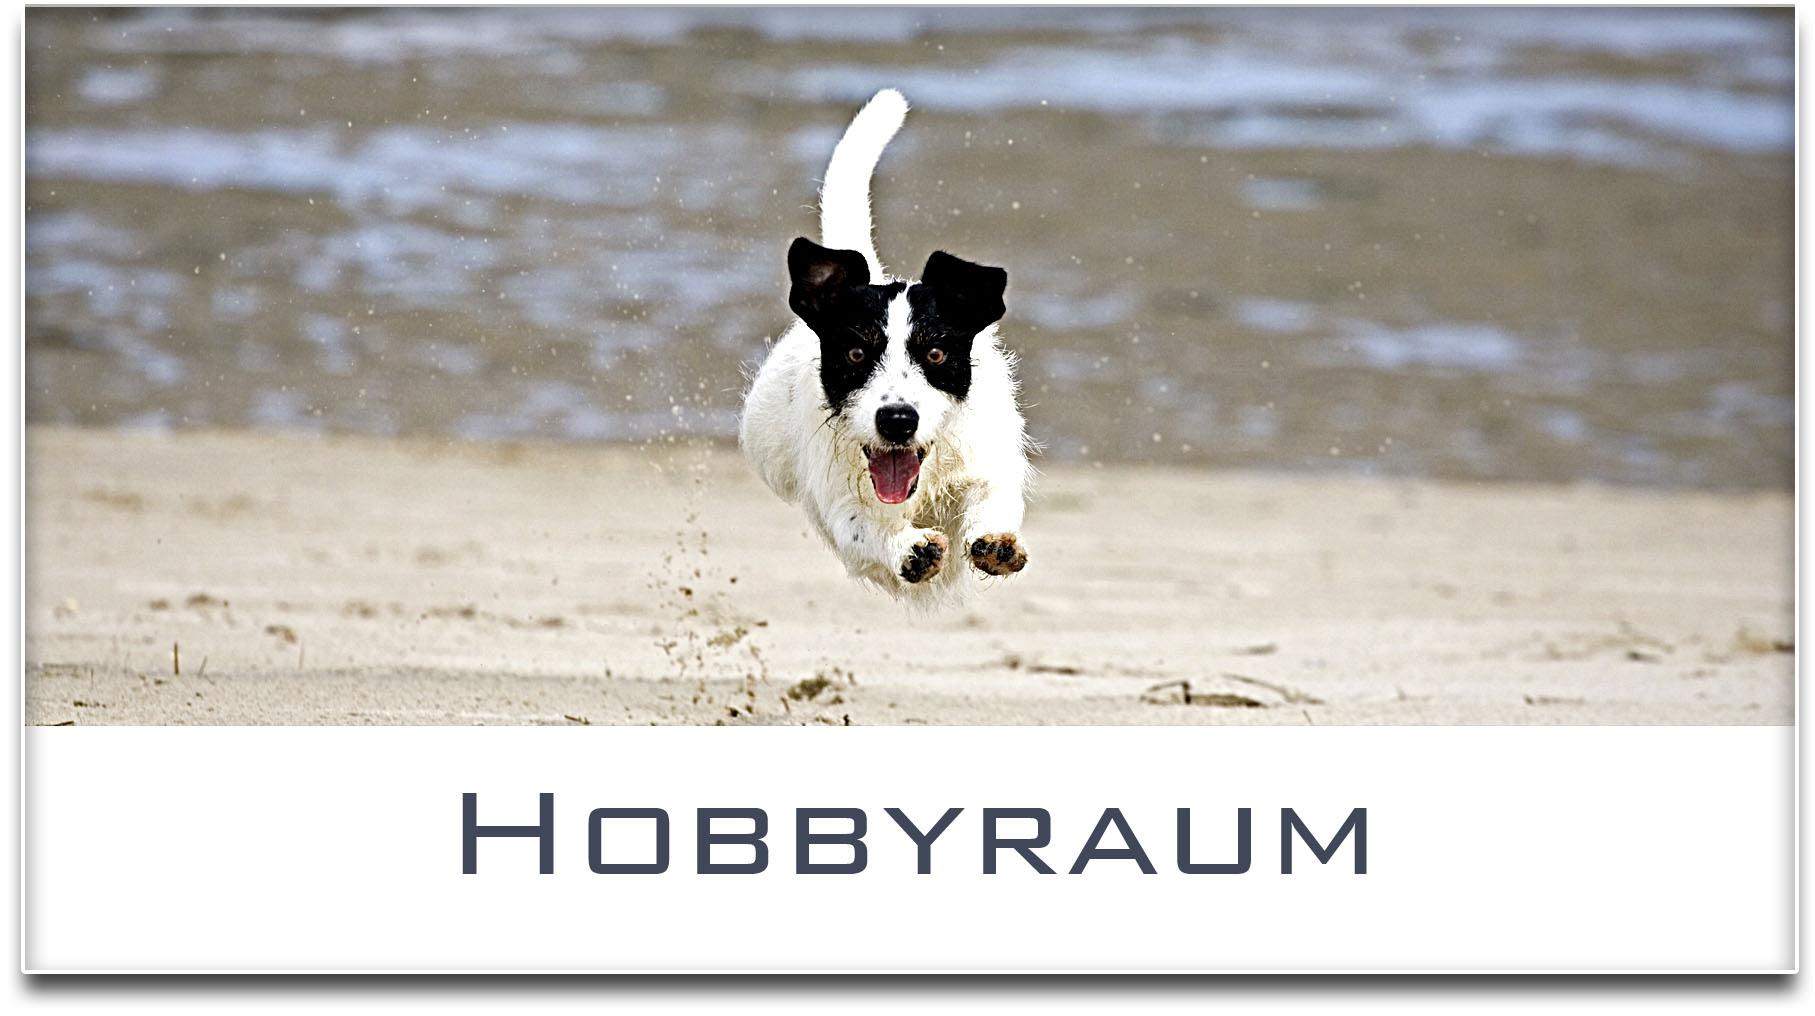 Türschild / Jack Russel Terrier / Hund / Hobbyraum / Selbstklebend